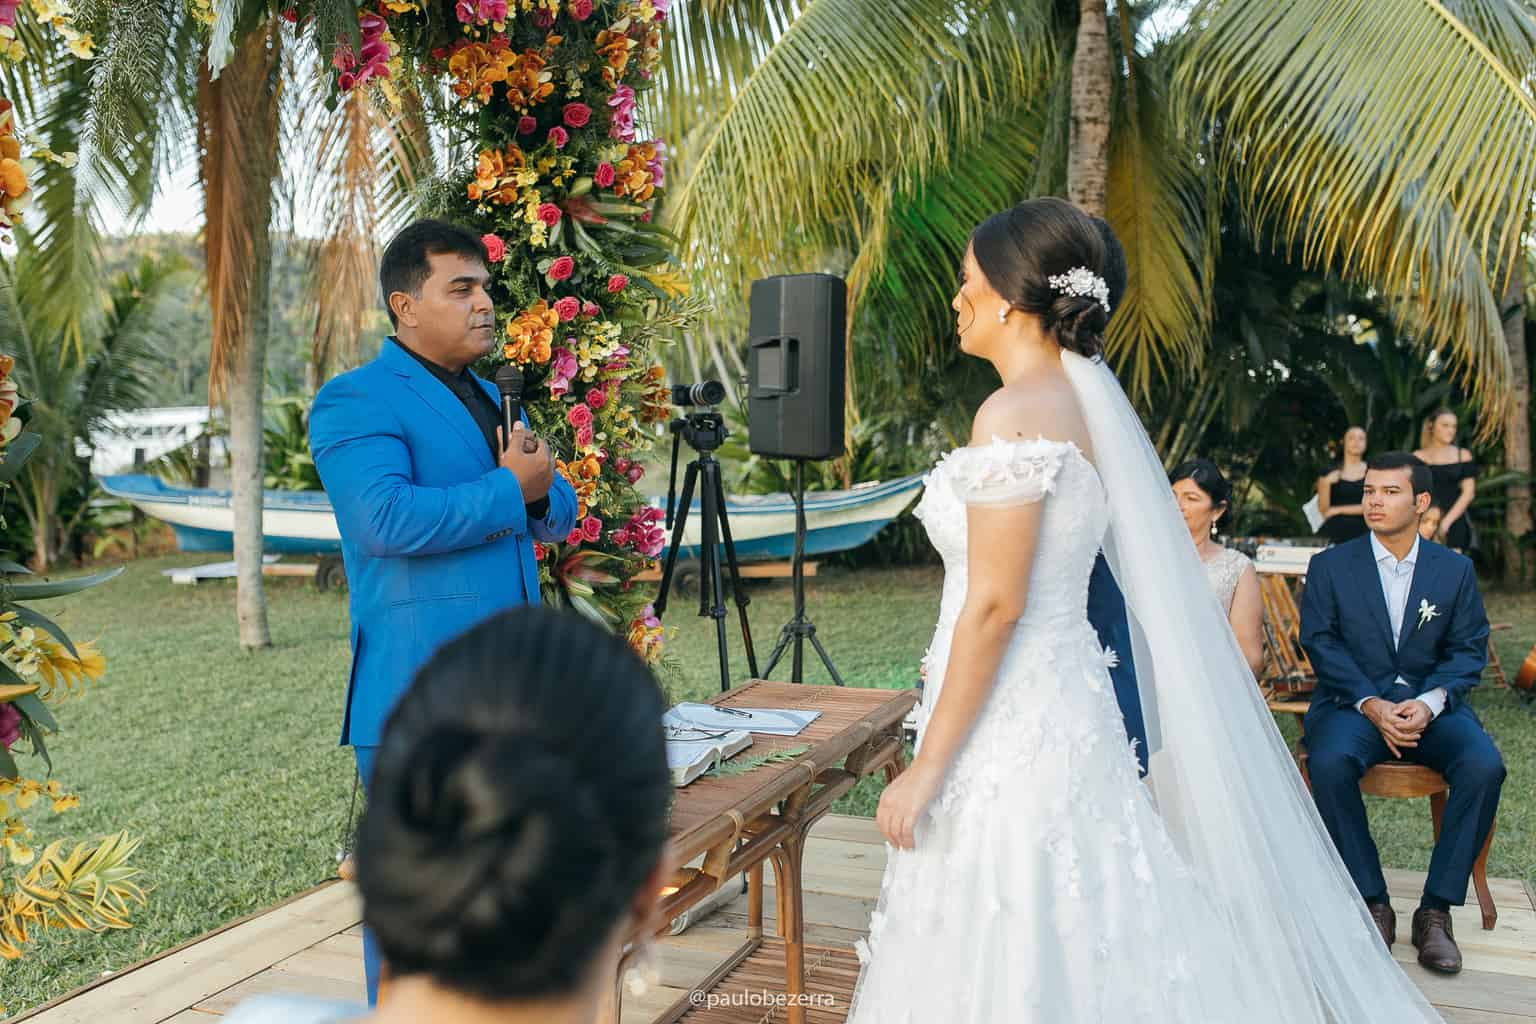 Casamento-Gardenia-e-Marcos-Antonio-Paulo-Bezerra-Joao-Curvelo-Carol-Maiorano0271-cerimonia